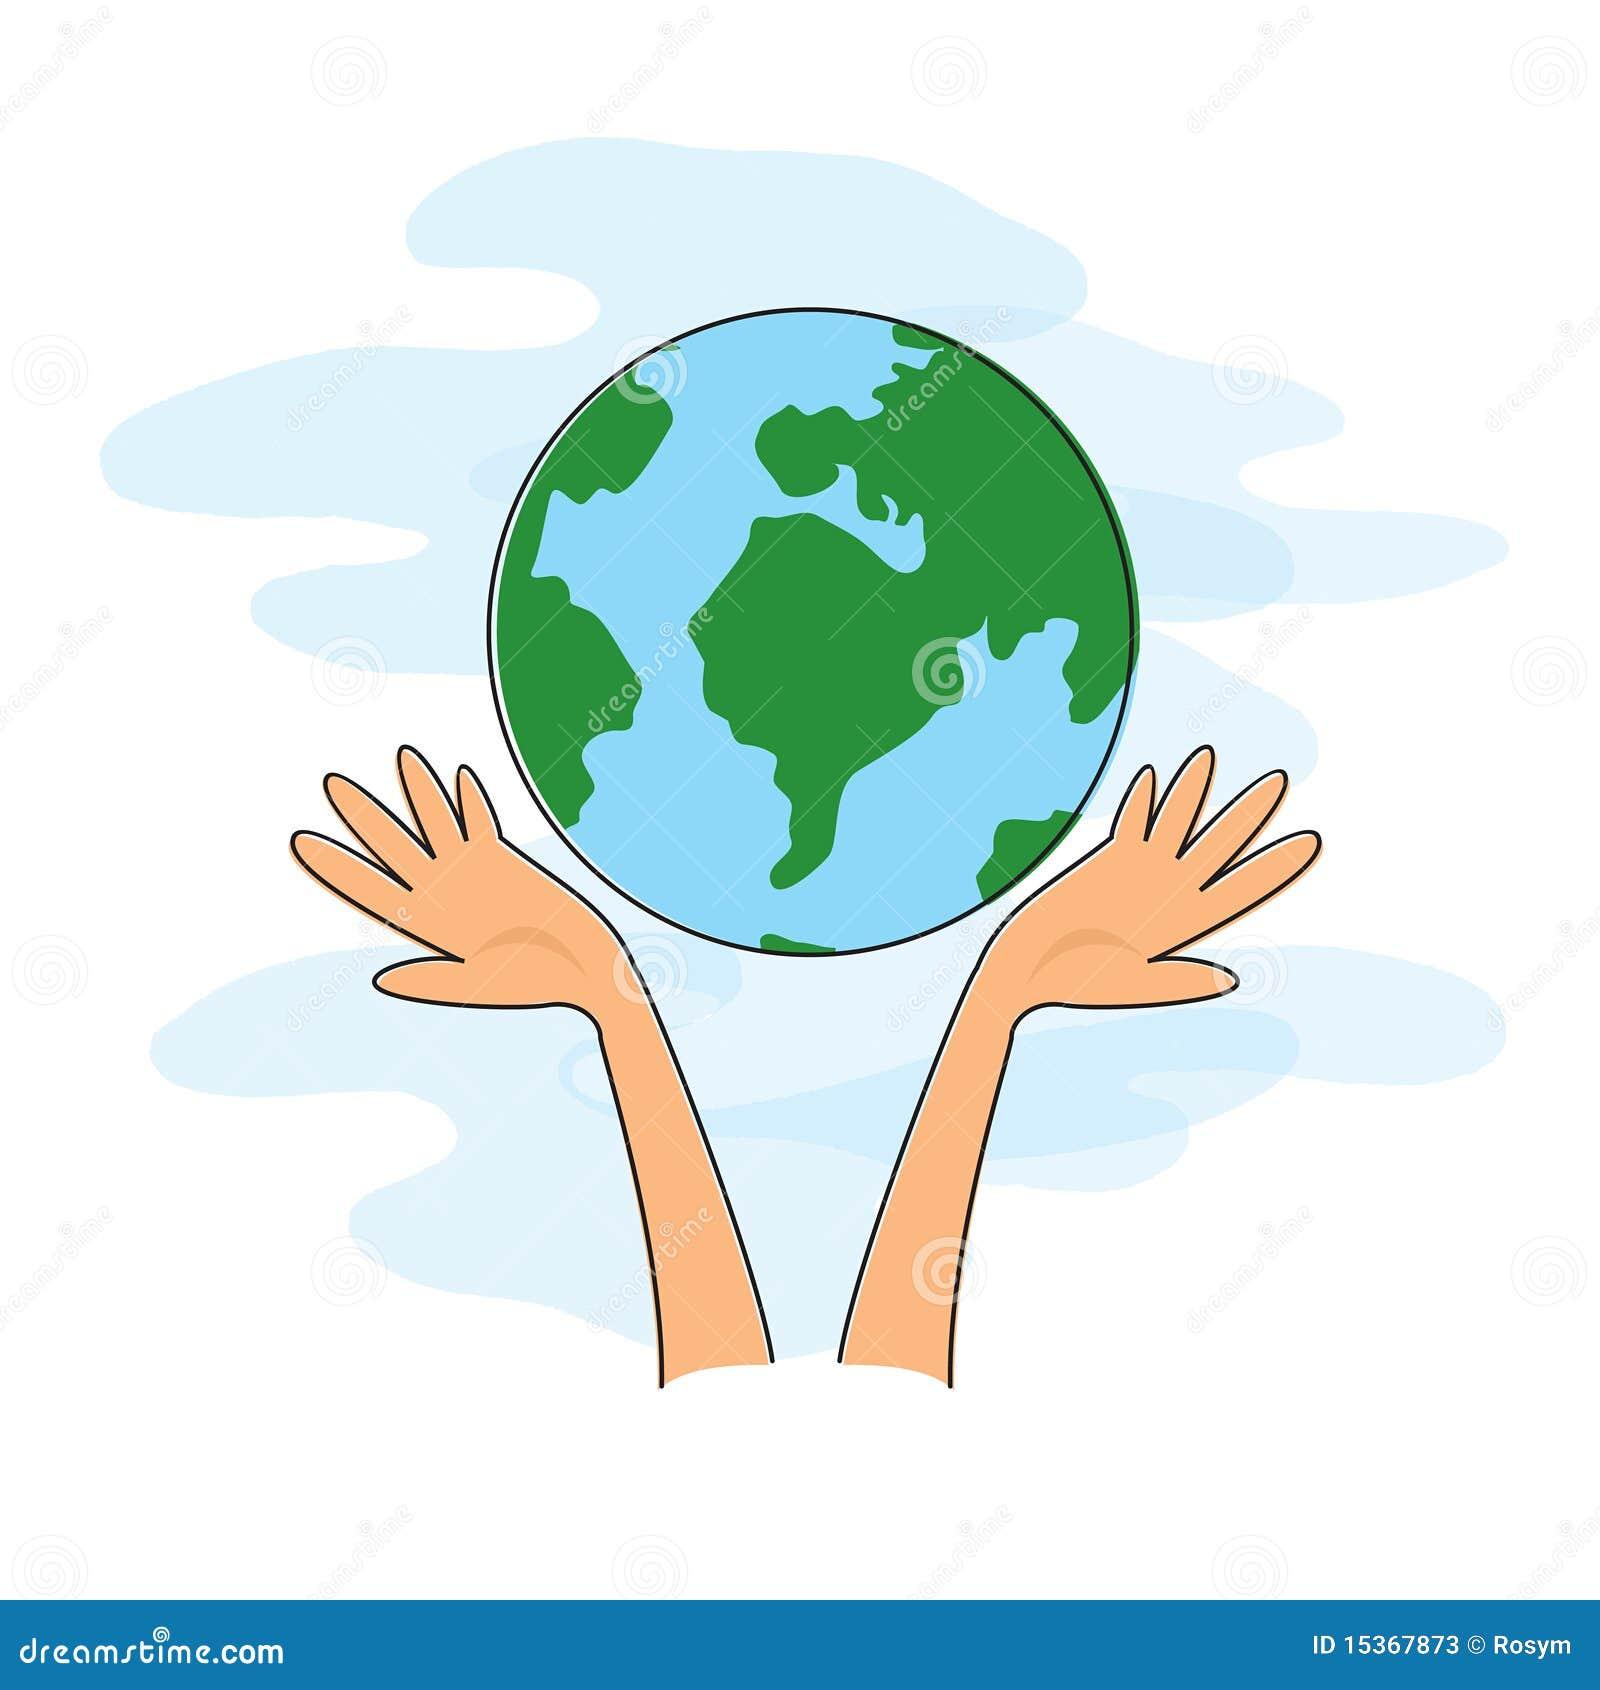 2 hands holding a globe cartoon version